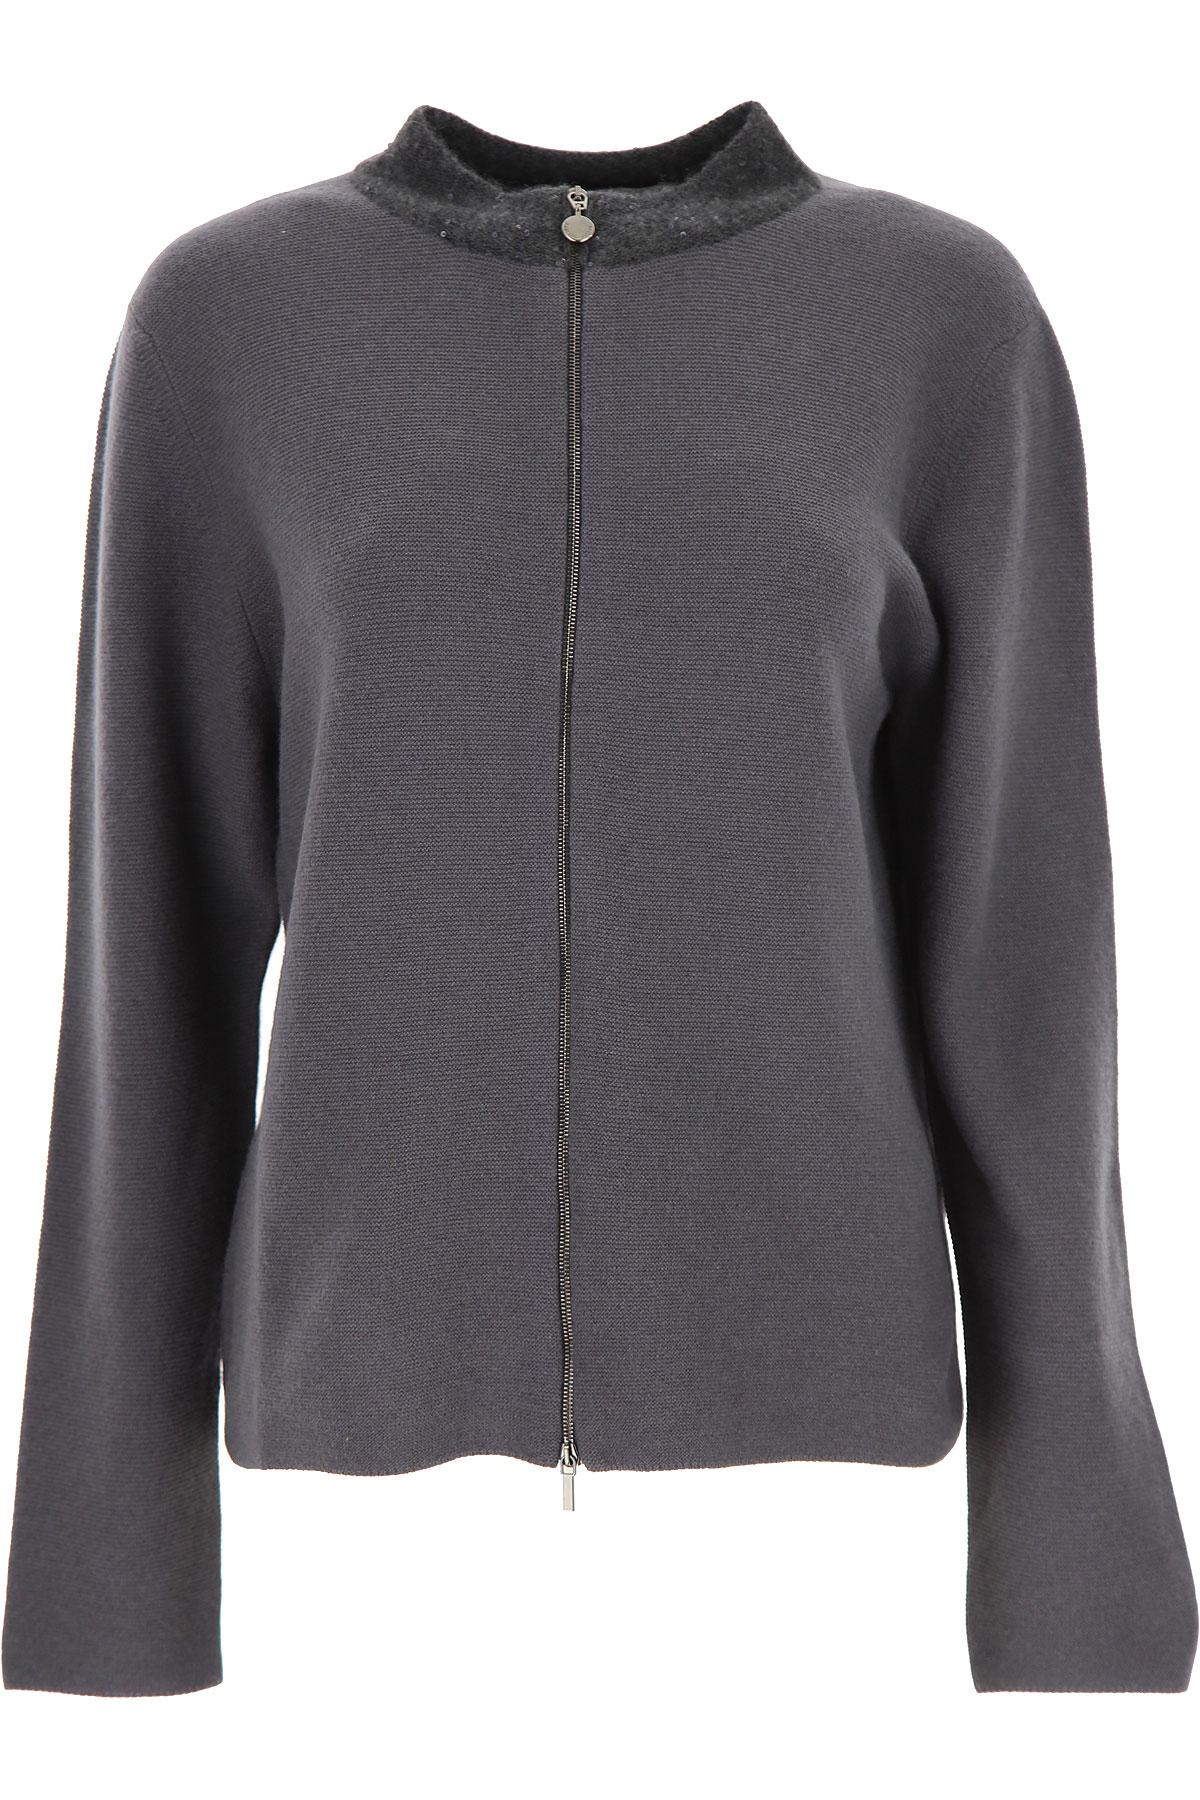 Fabiana Filippi Sweater for Women Jumper On Sale, antracite, Virgin wool, 2019, 4 6 8